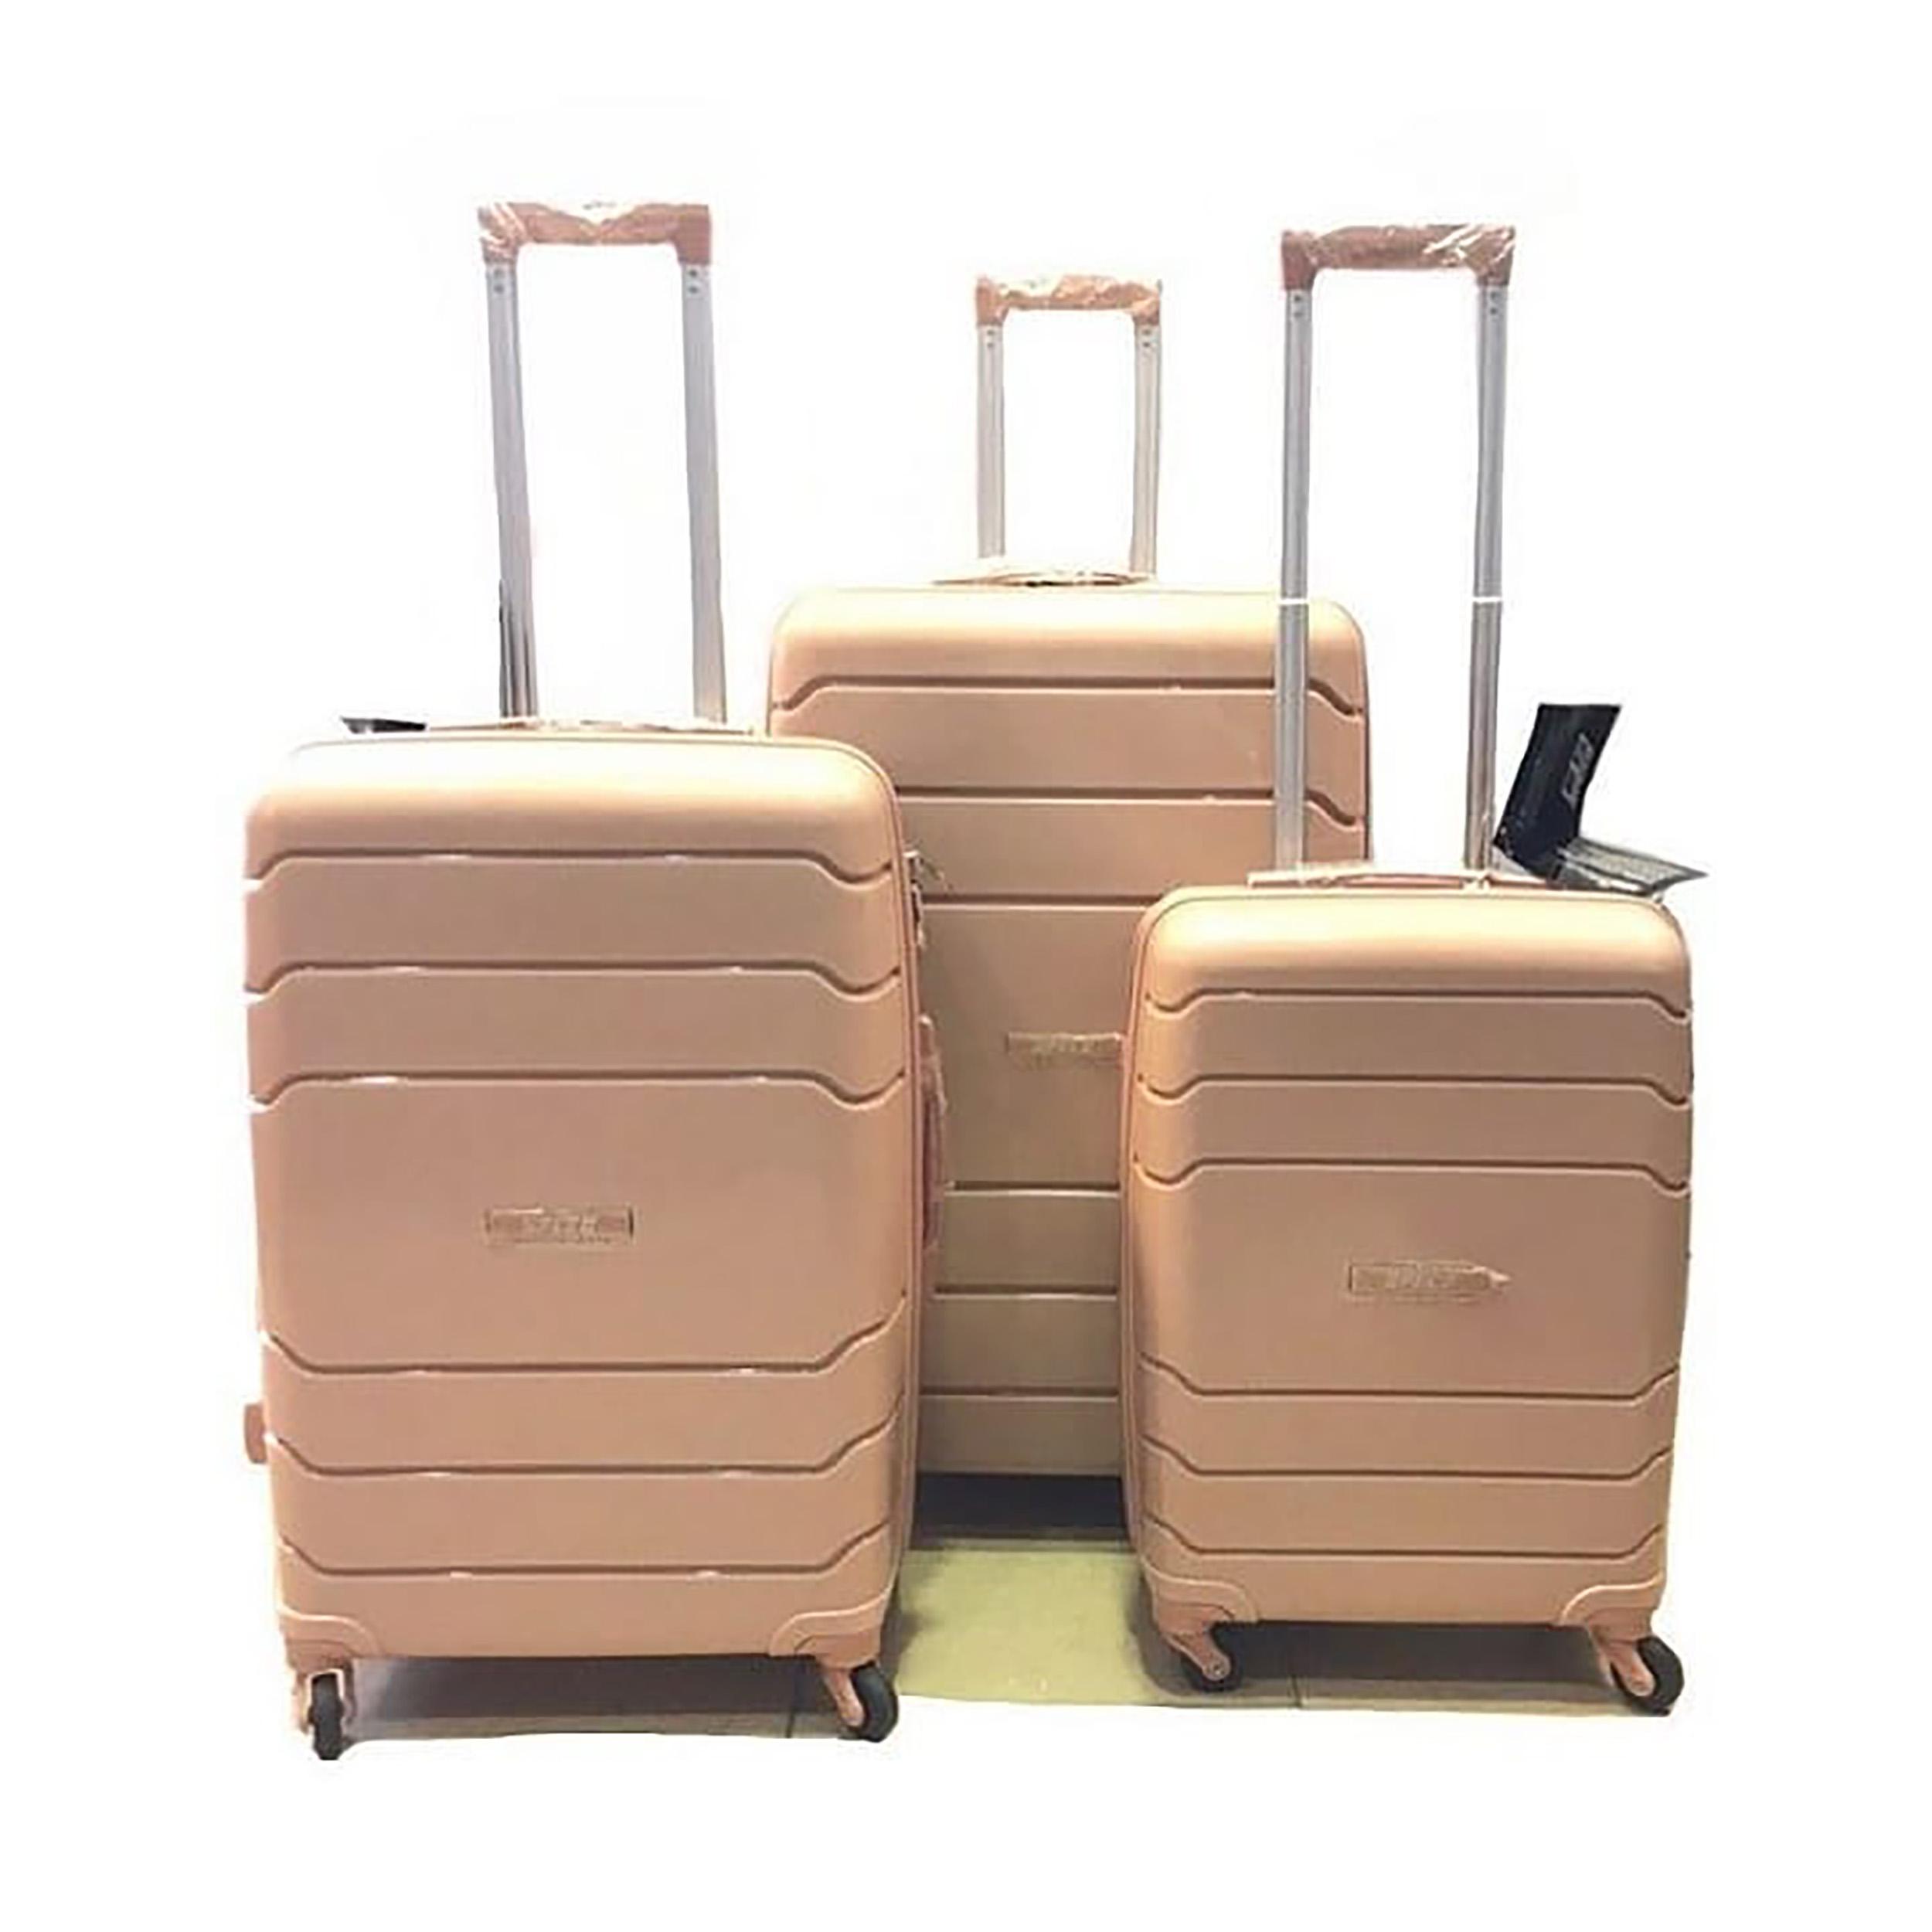 مجموعه سه عددی چمدان اسپید کد B016 main 1 9